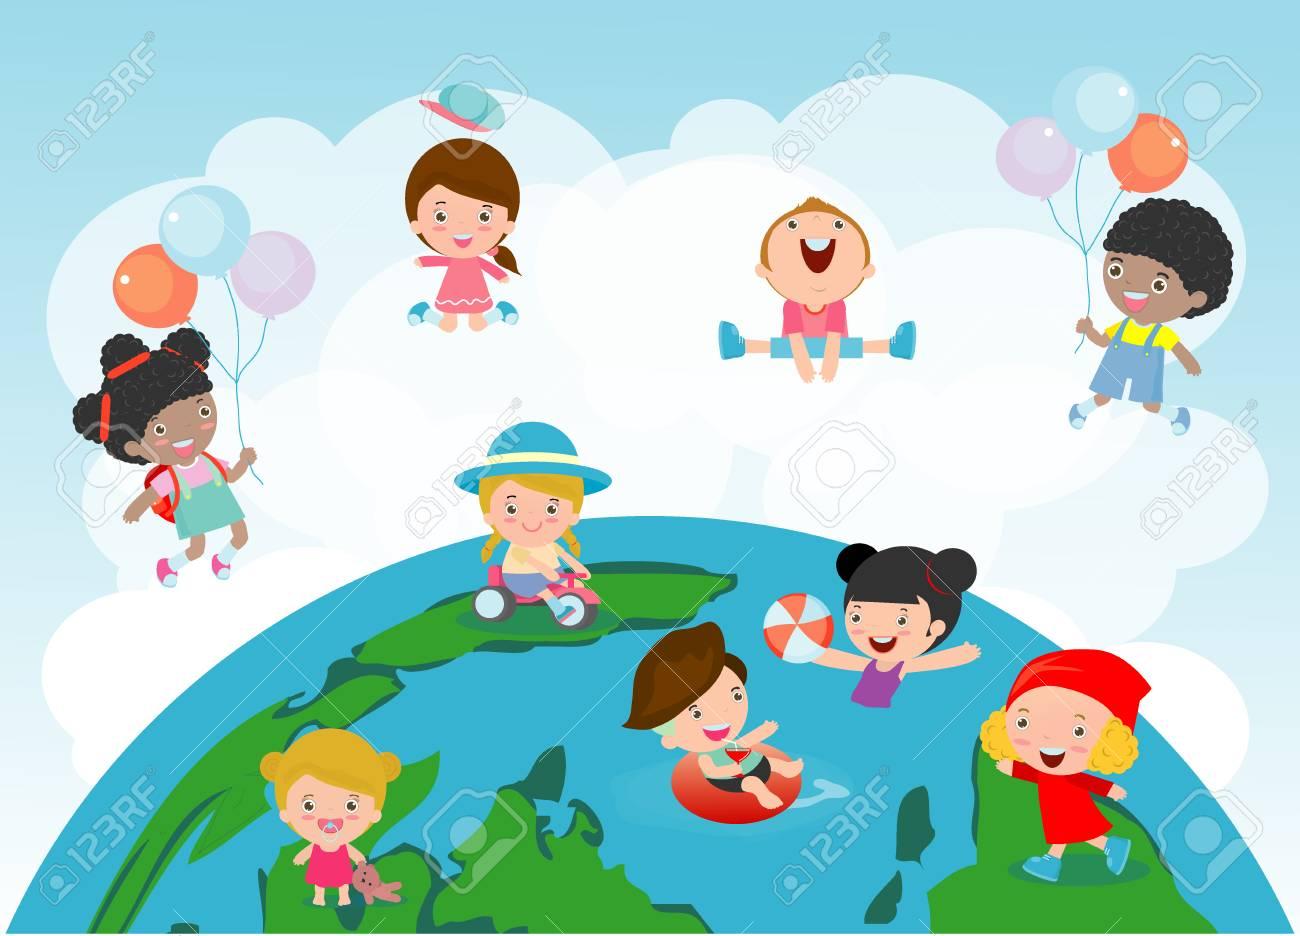 Vettoriale Bambini Felici Di Diverse Nazionalità In Un Globo